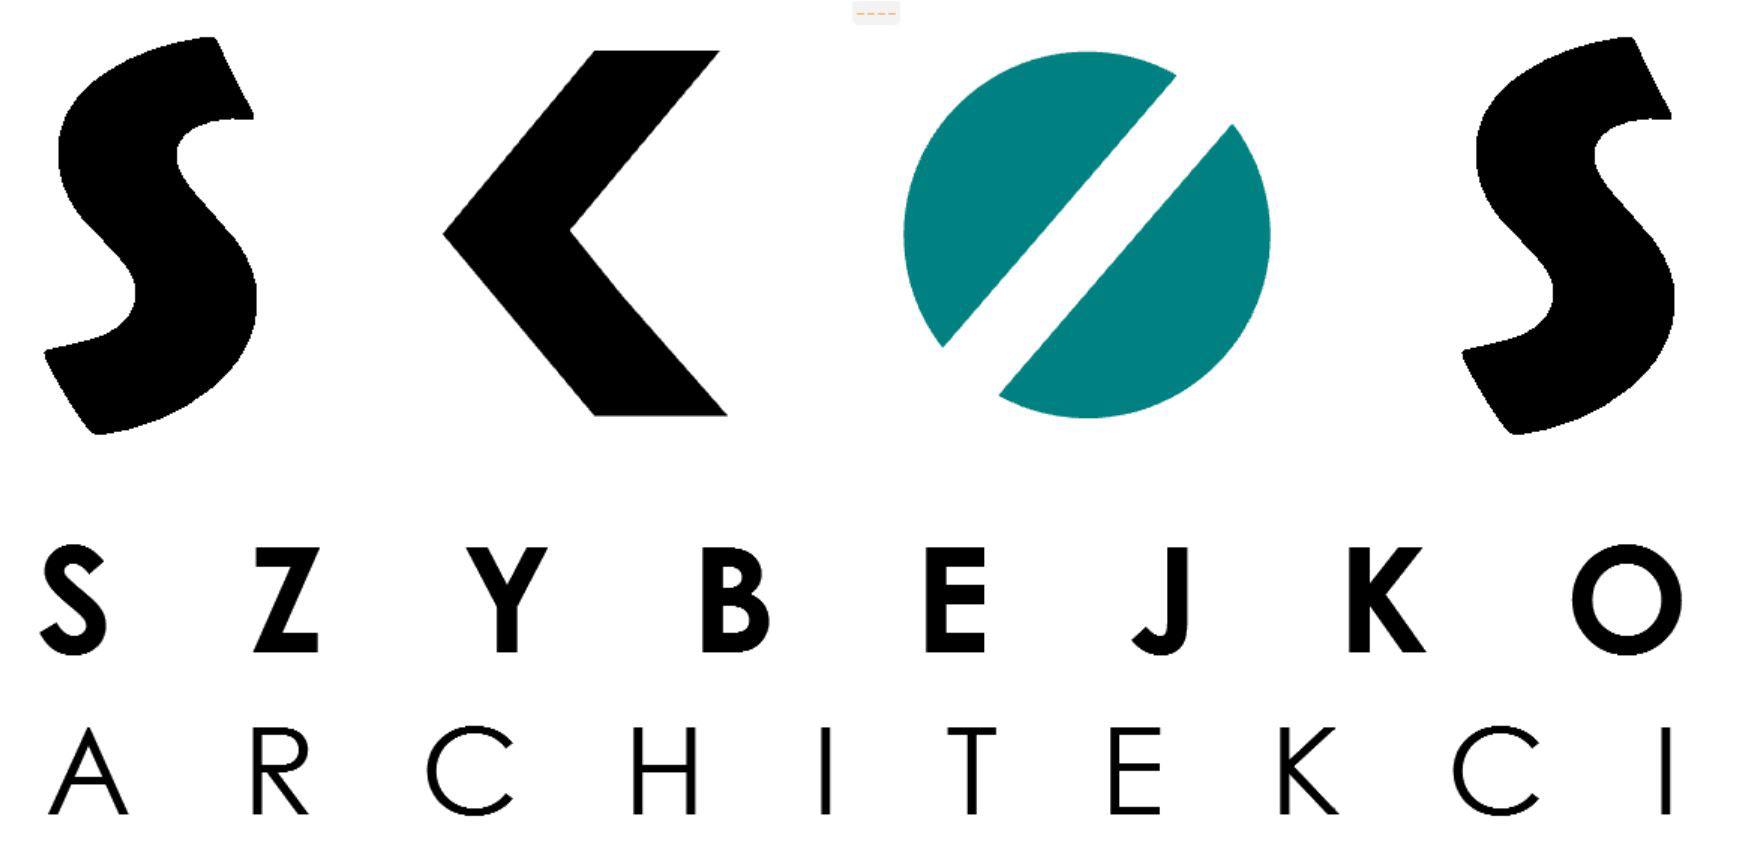 SKOS - Szybejko Architekci